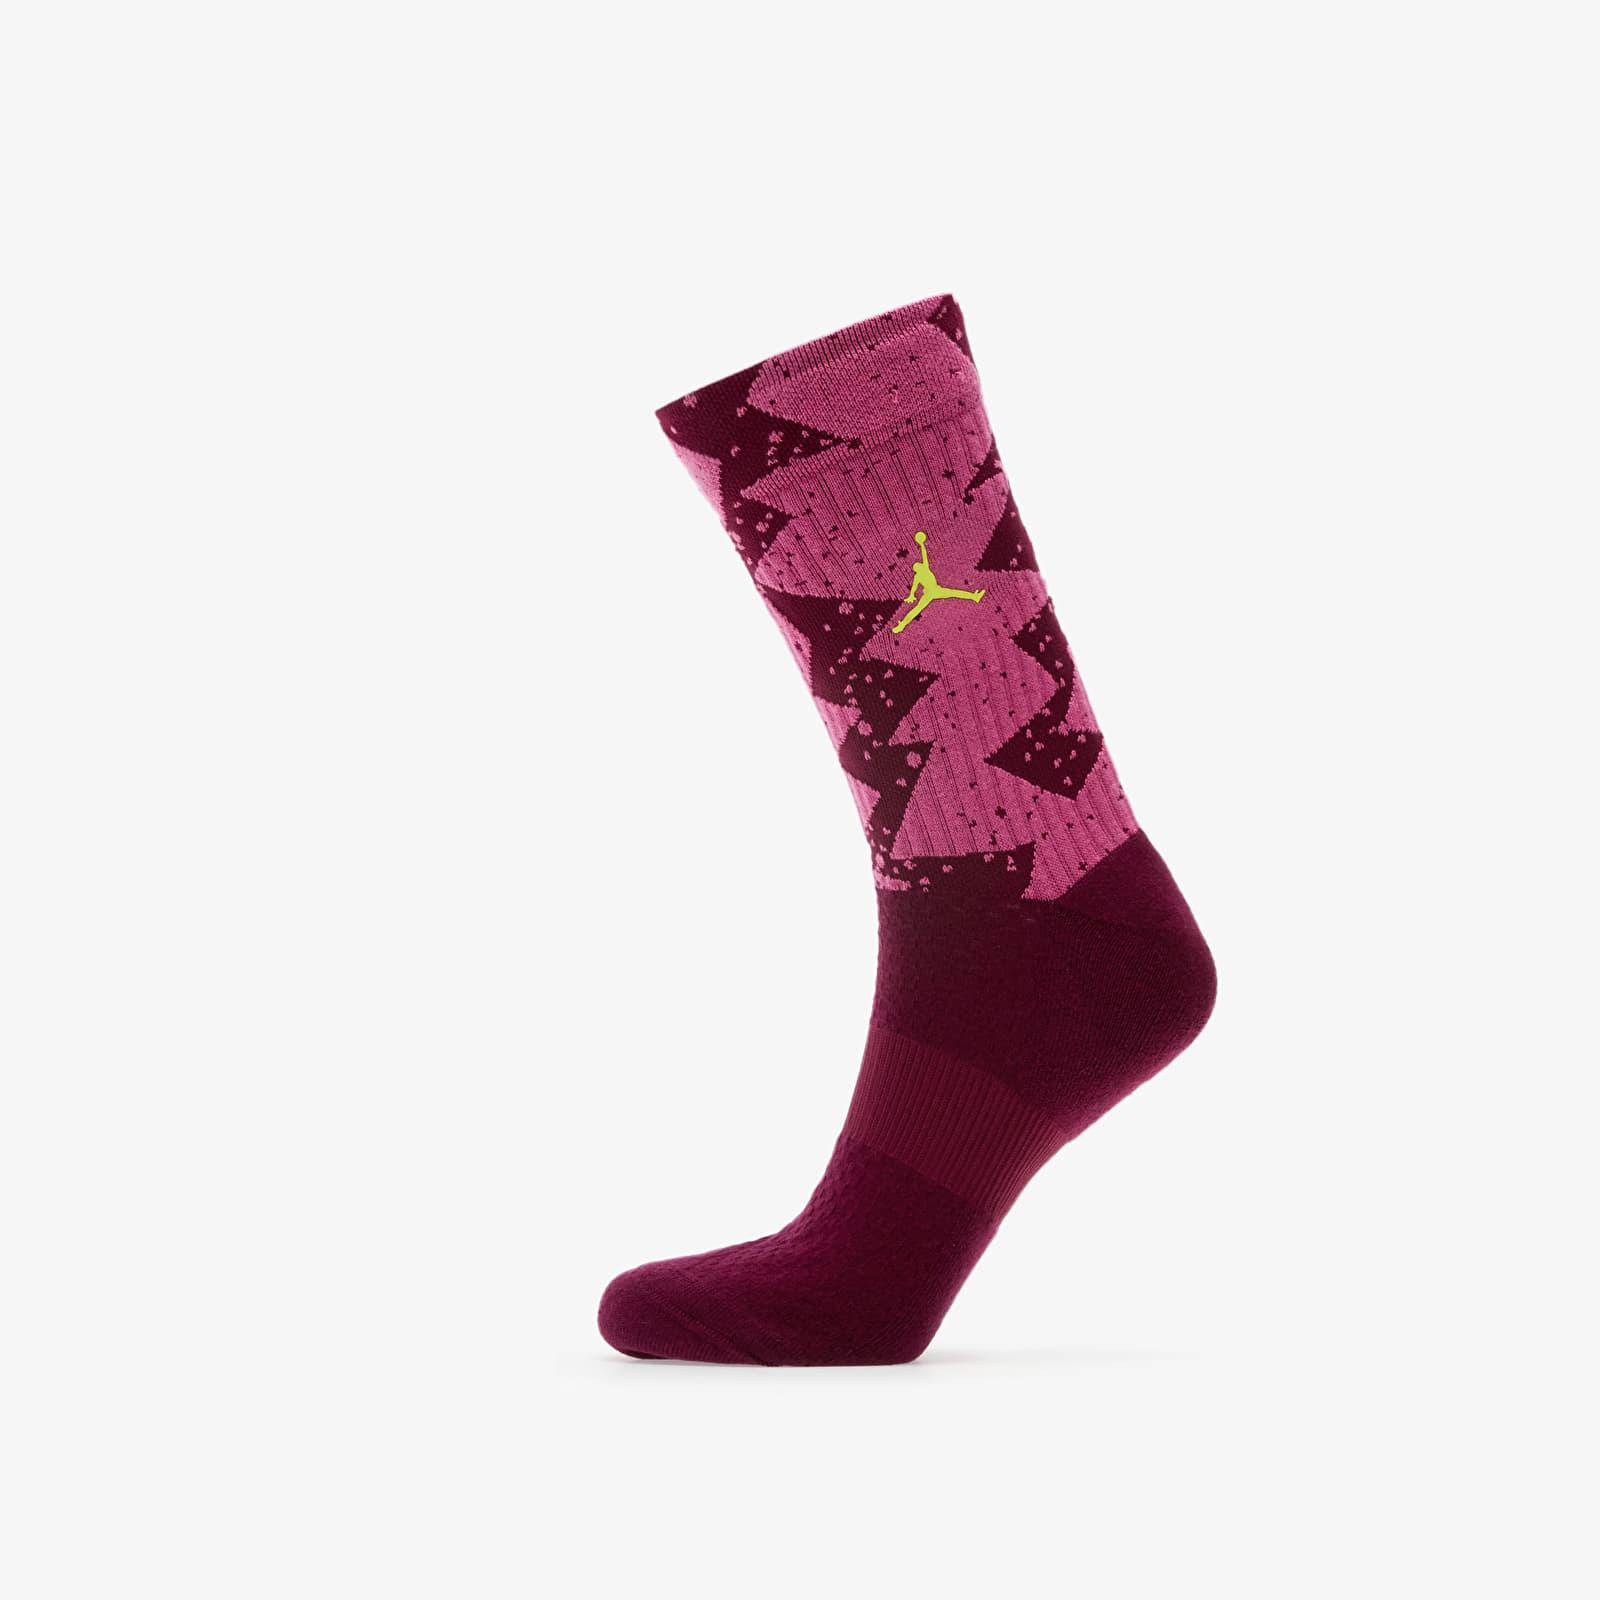 Socks Jordan Legacy Poolside Crew Socks 1-pair Bordeaux/ Cosmic Fuchsia/ Cyber